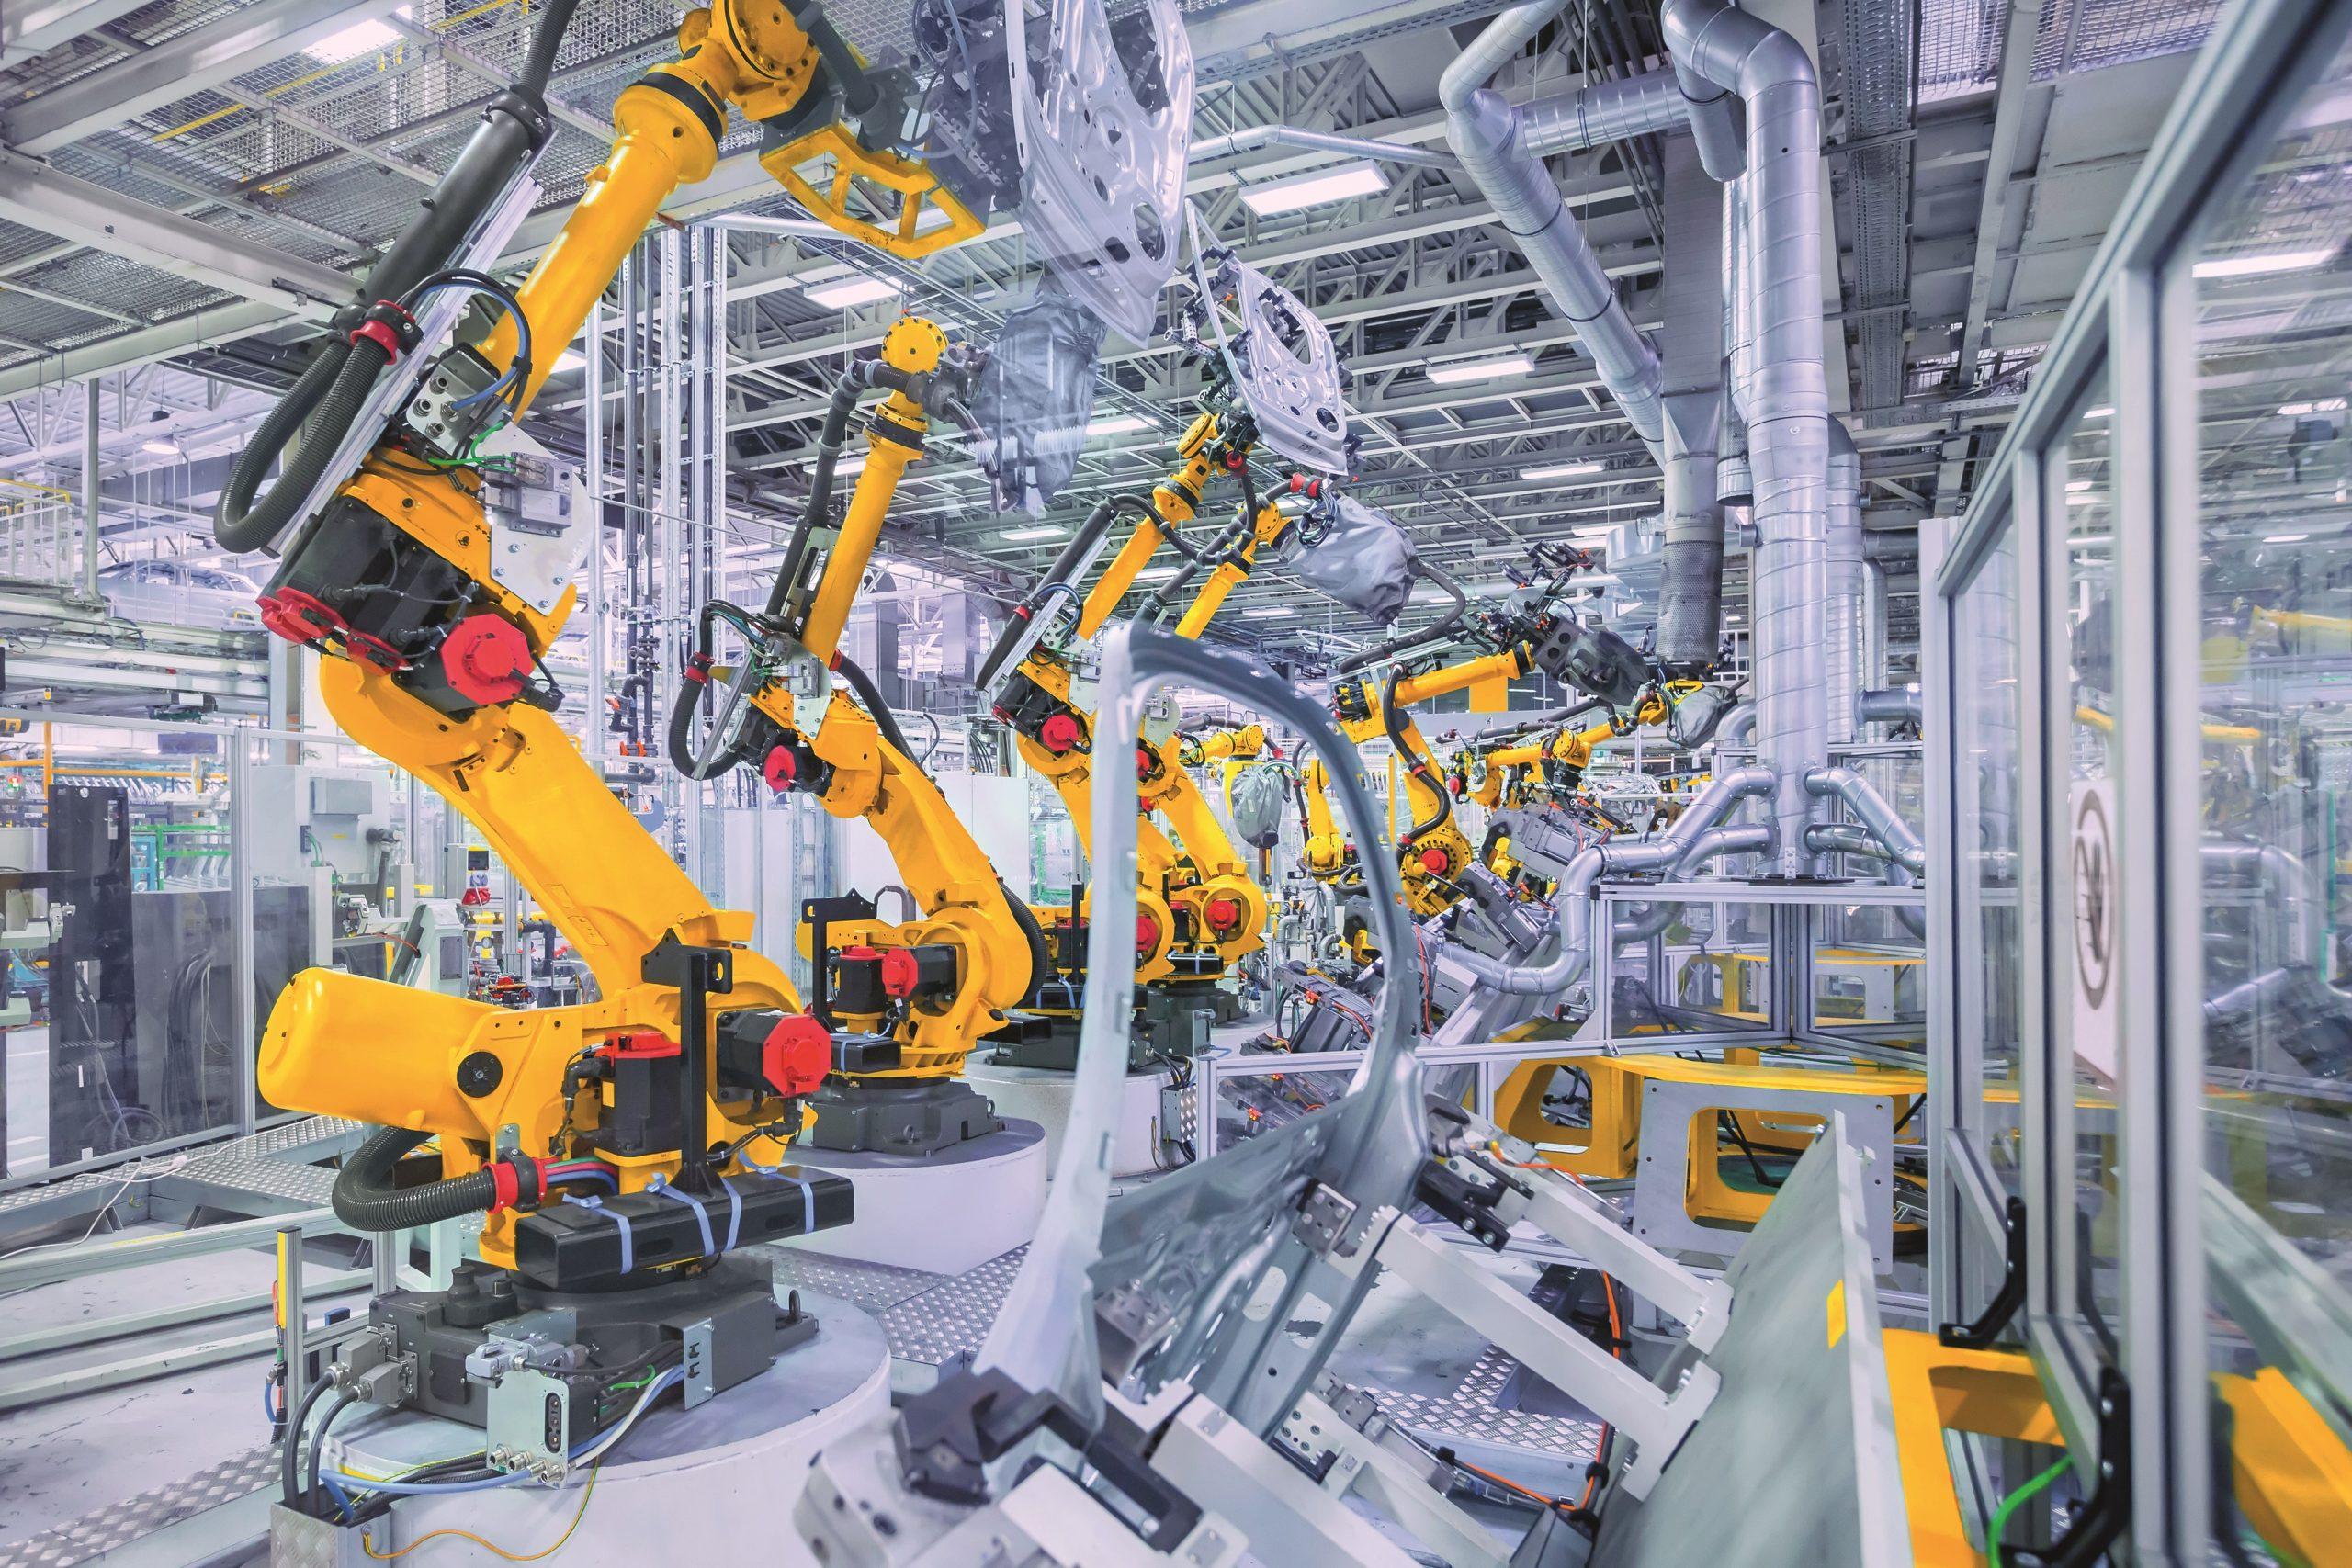 Profinet-Leitungenan Robotern